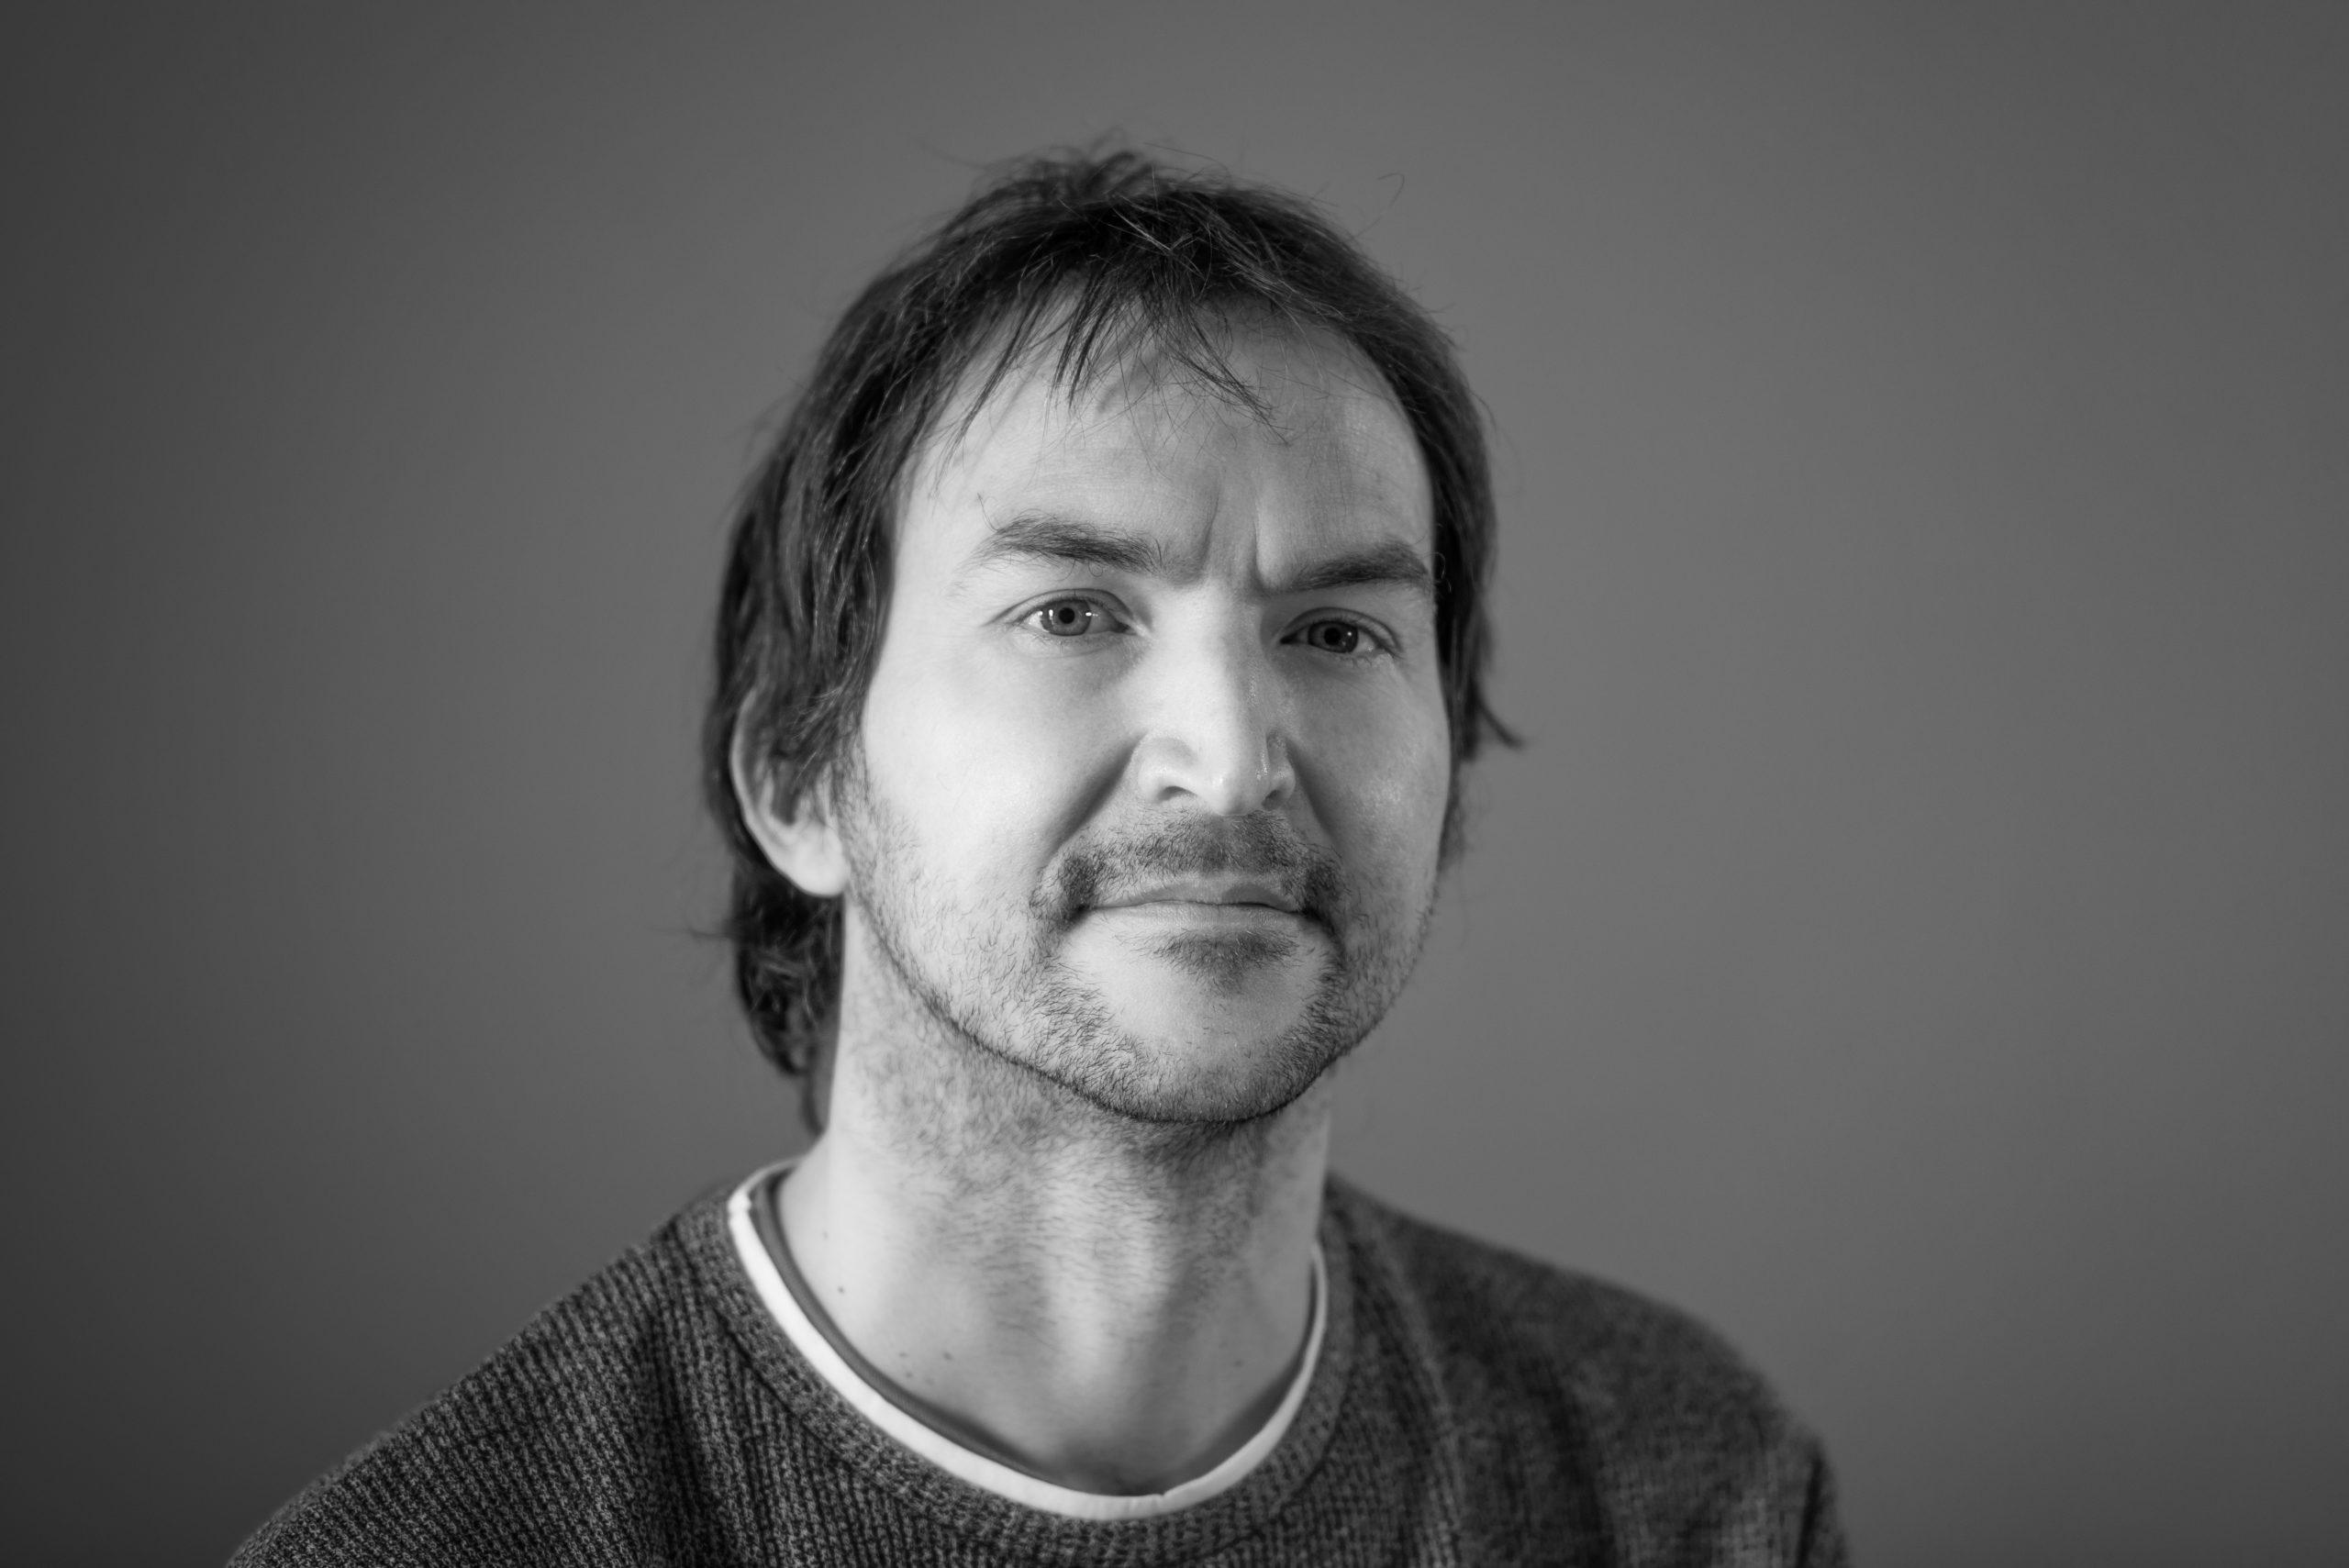 David Blasco